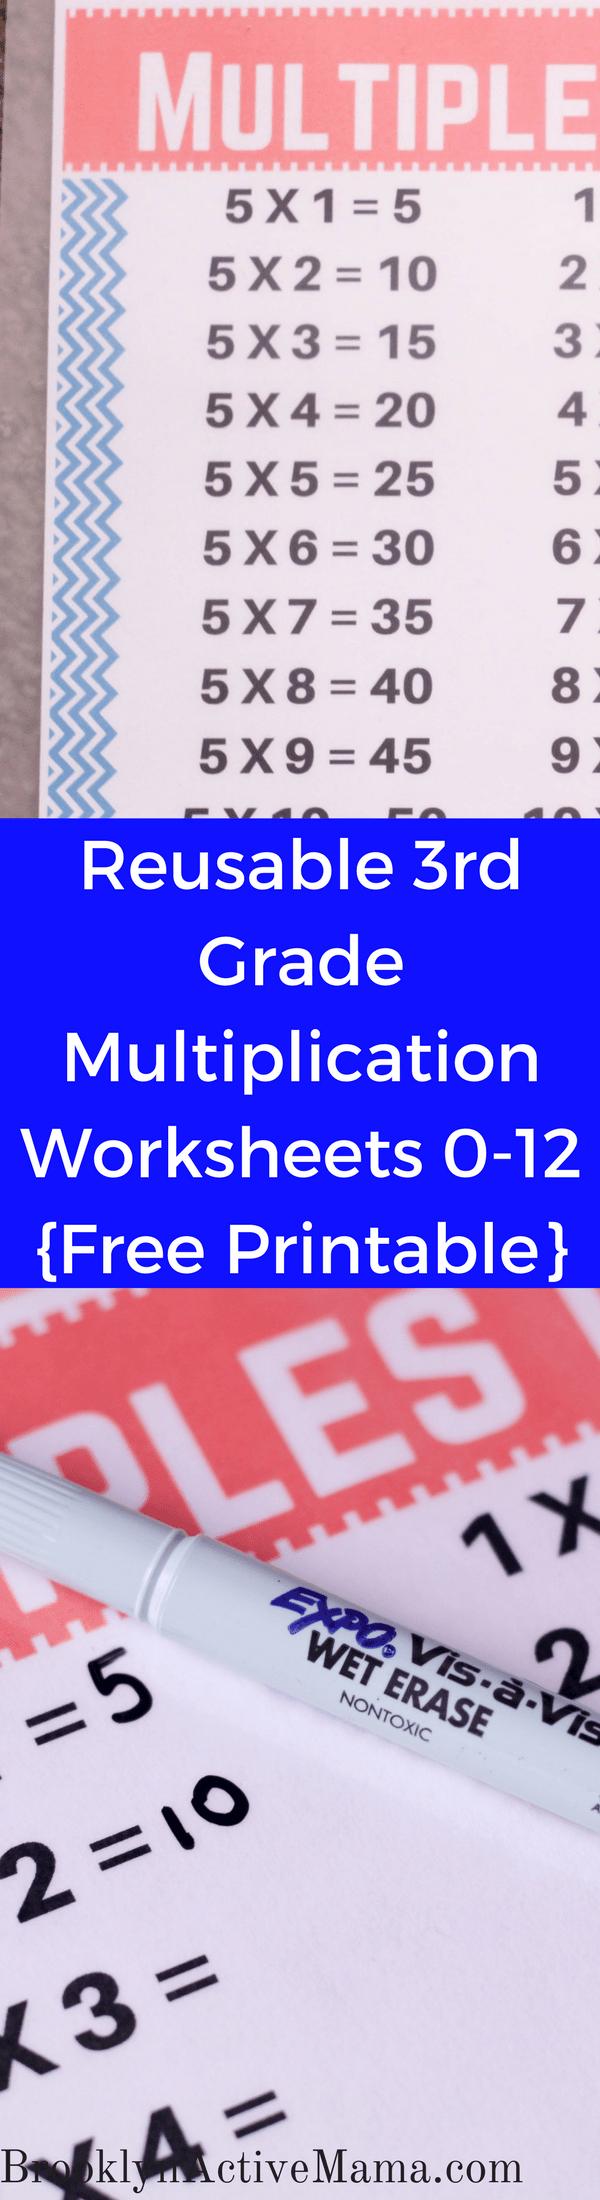 Reusable Third Grade Multiplication Worksheets - Free Printable ...